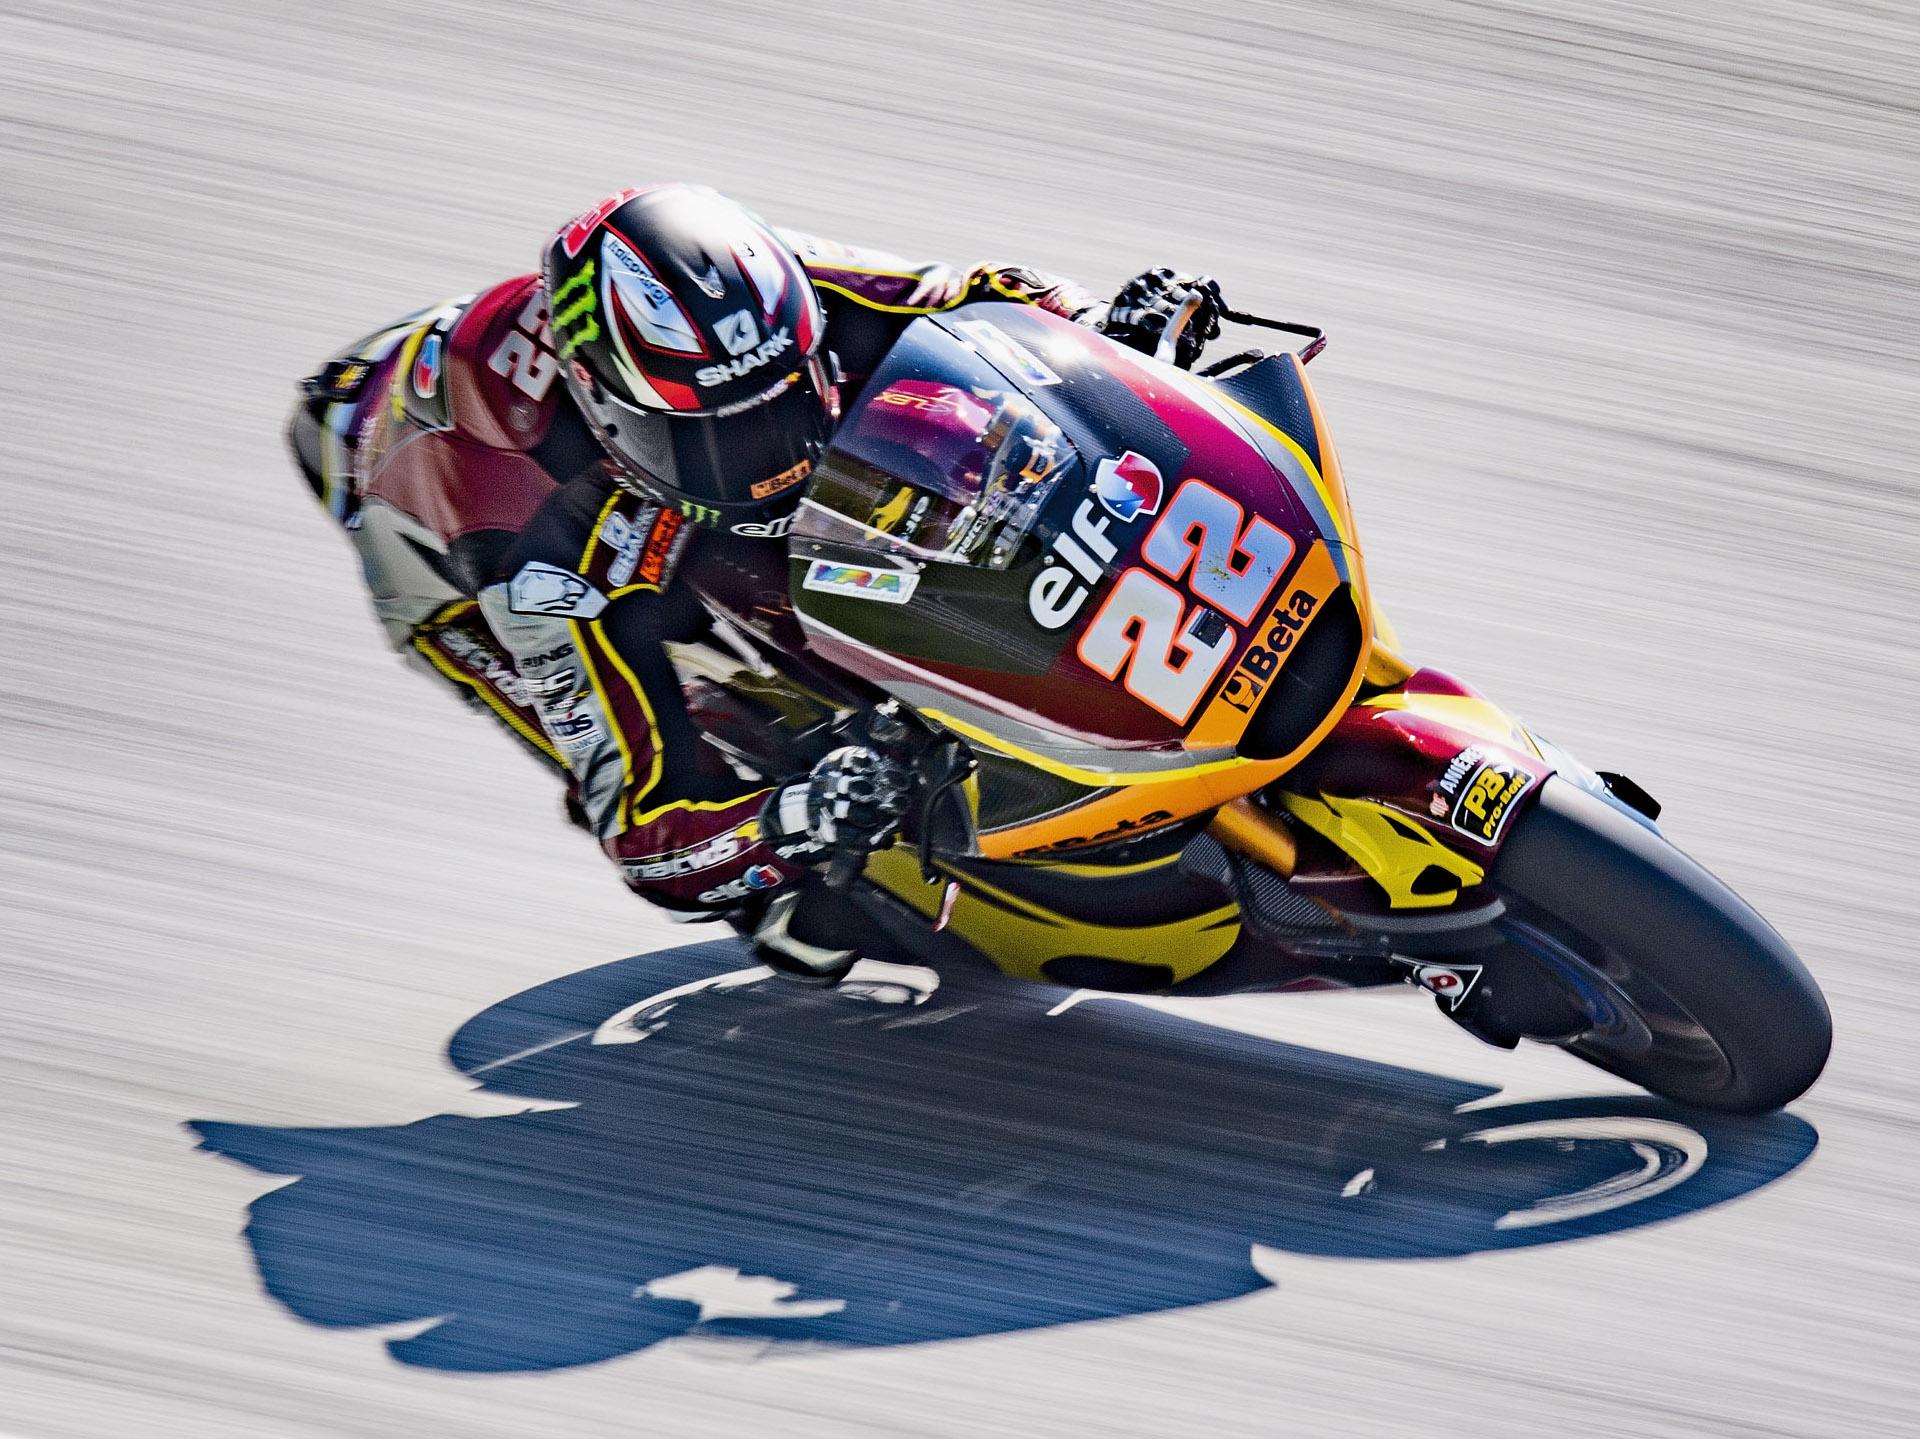 Austria, parrilla de salida Moto2: pole para ¡Lowes!, Raúl Fernández segundo.